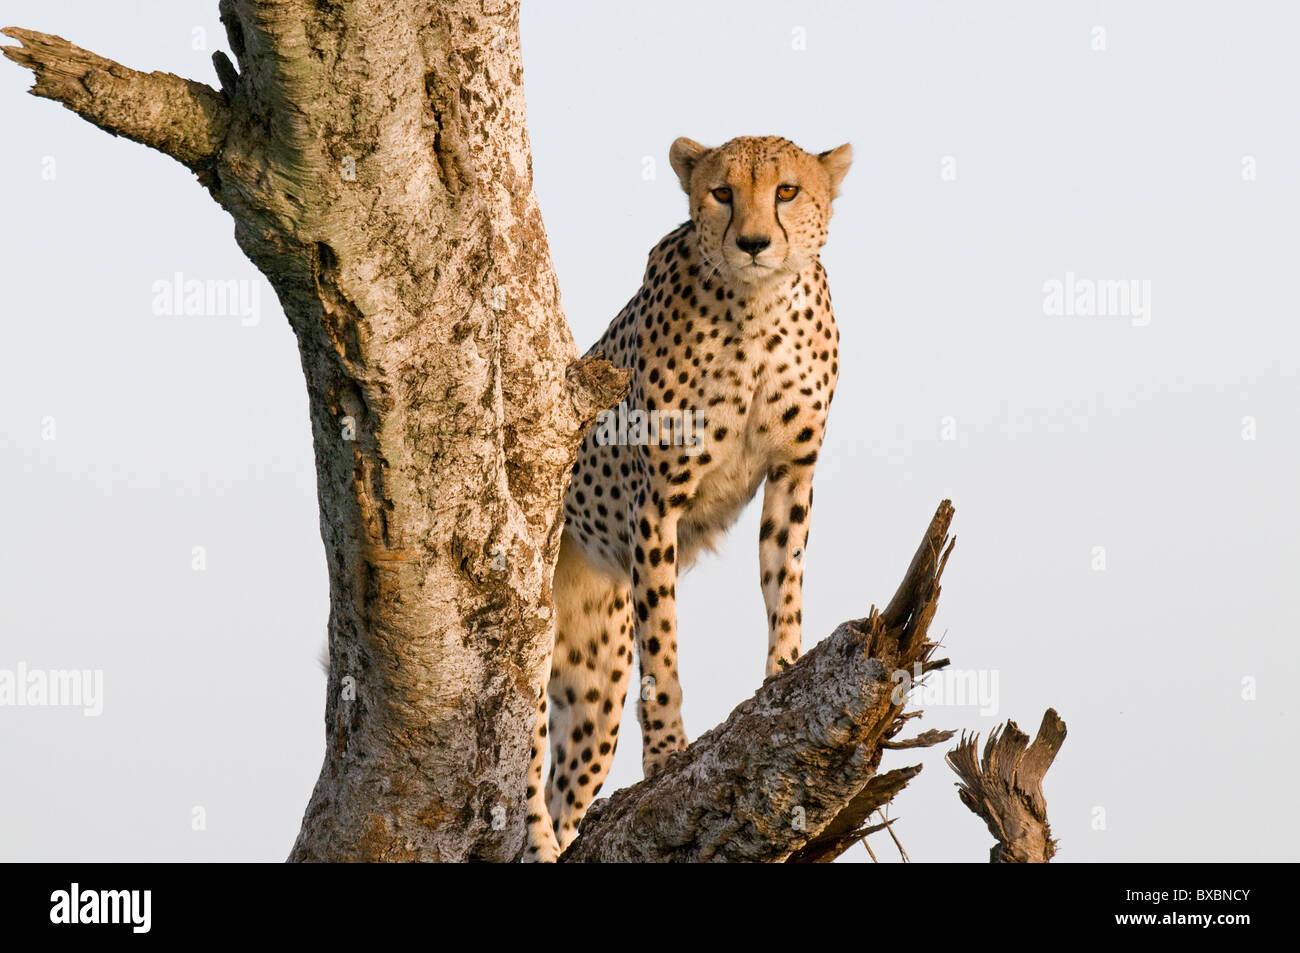 Cheetah - Stock Image